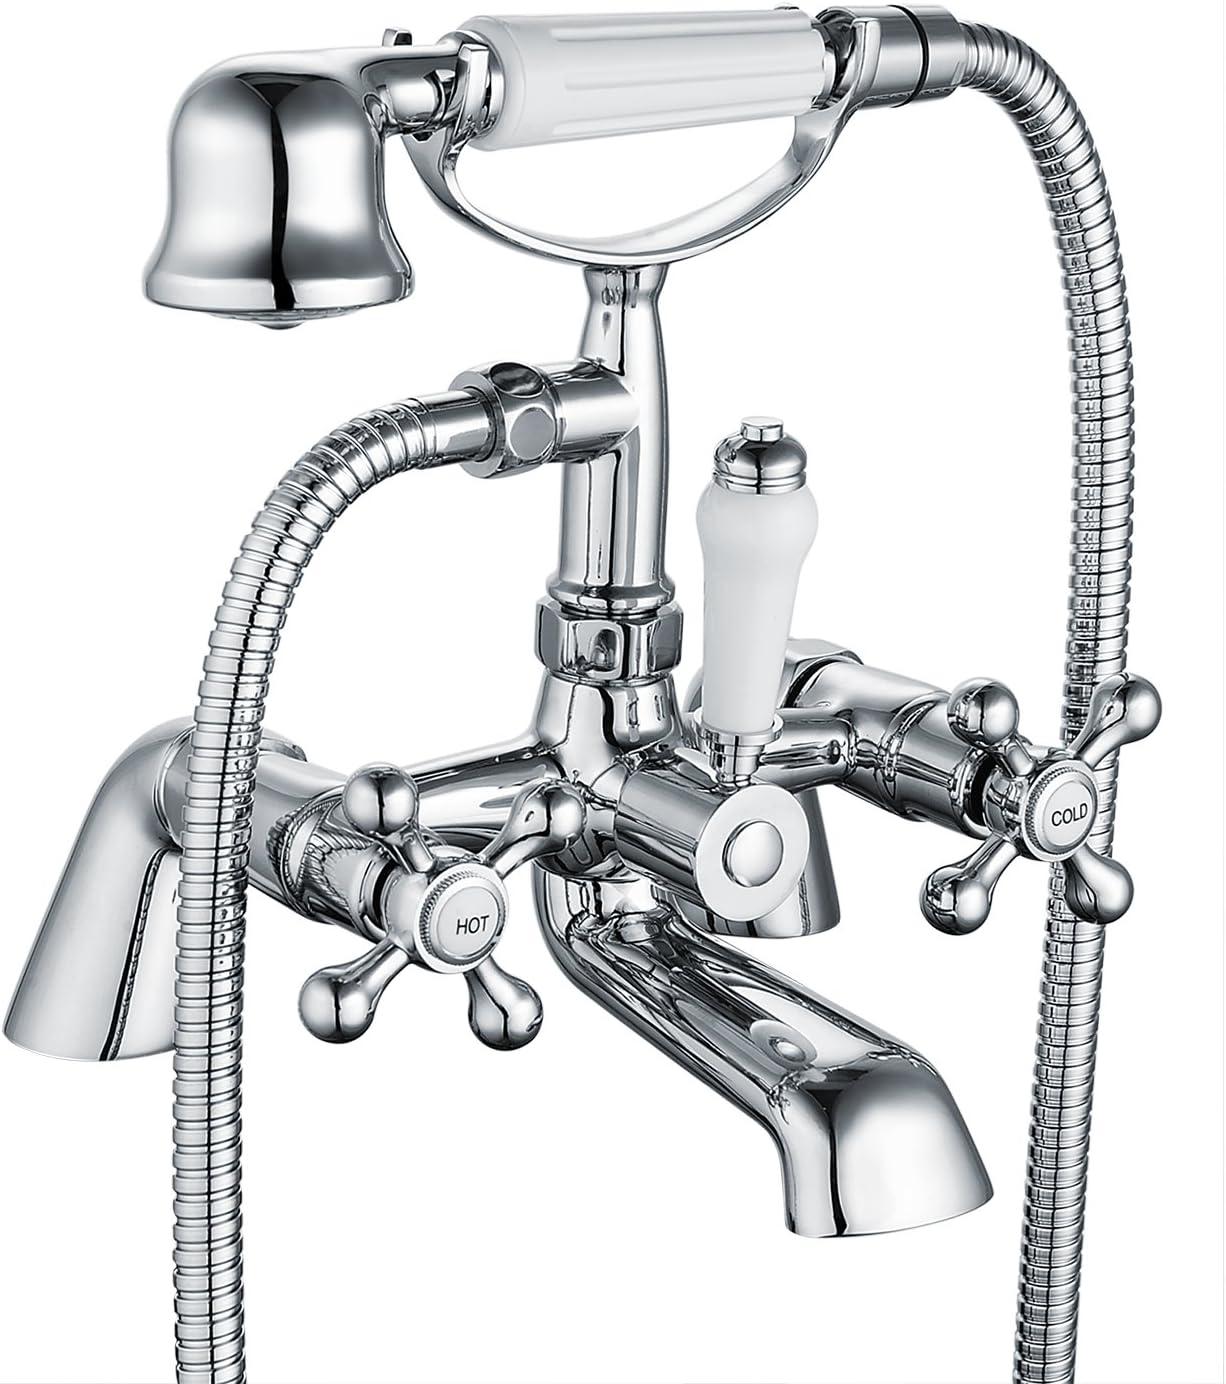 Funime 05 O Victoria Bath 1/4 Turn with Handheld Bathroom Shower Taps Ceramic Dual Lever, Chrome